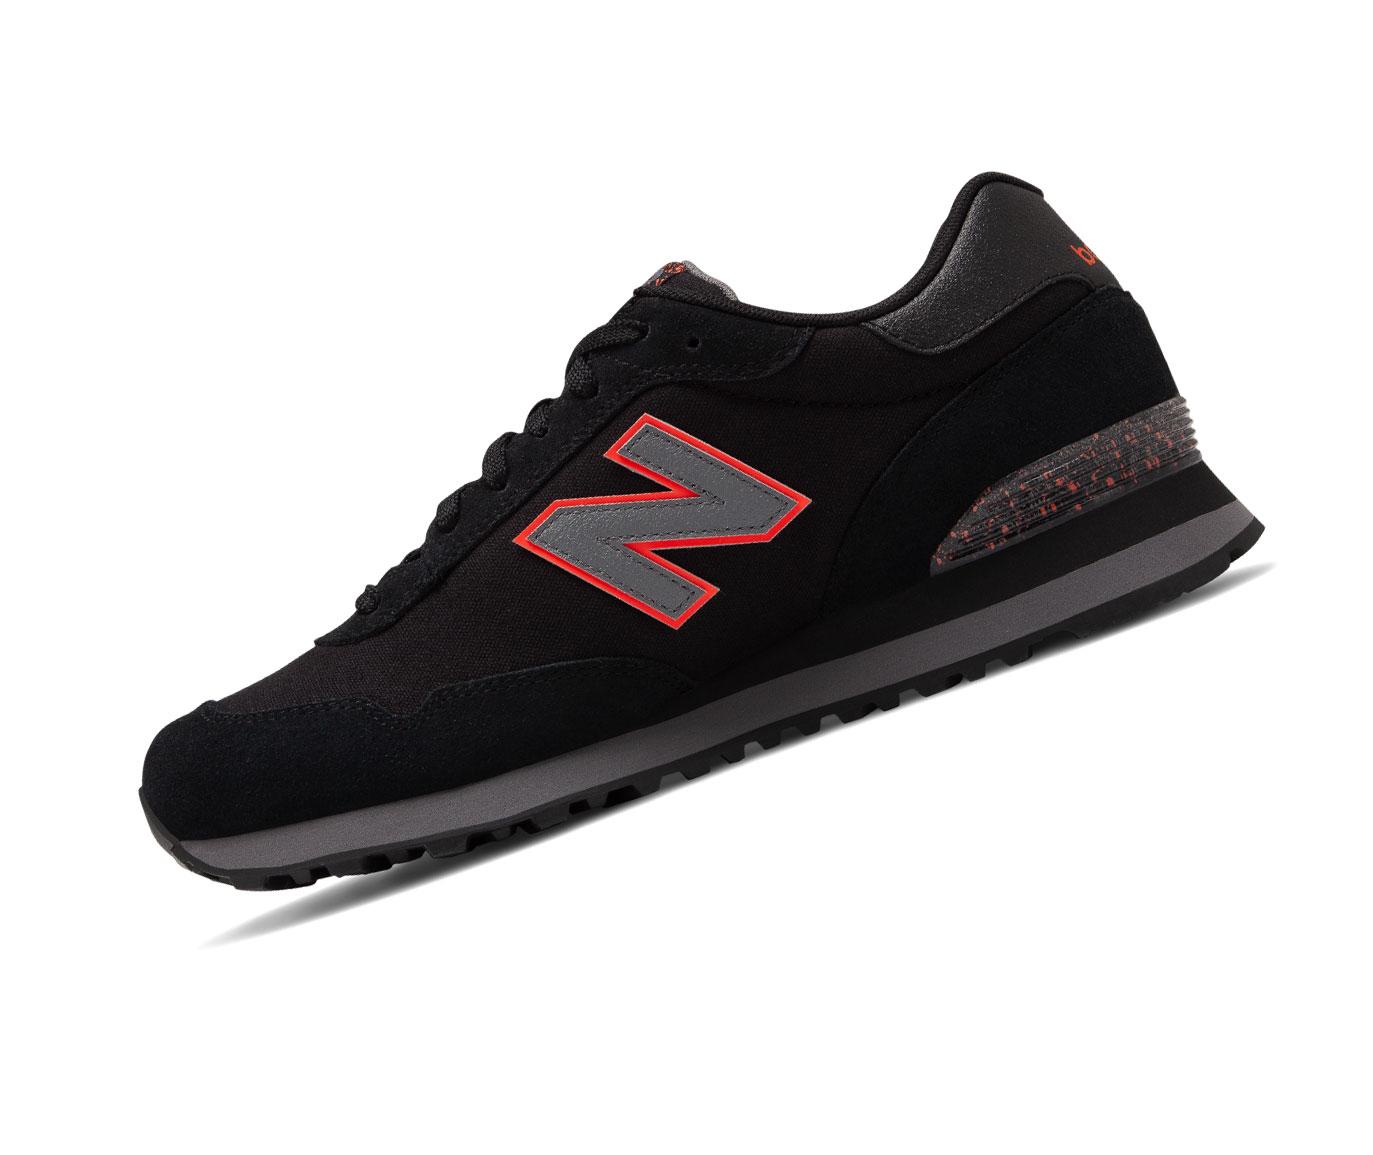 New Balance 515 Lifestyle ML515NBB Schwarz Retro Herren Sneaker